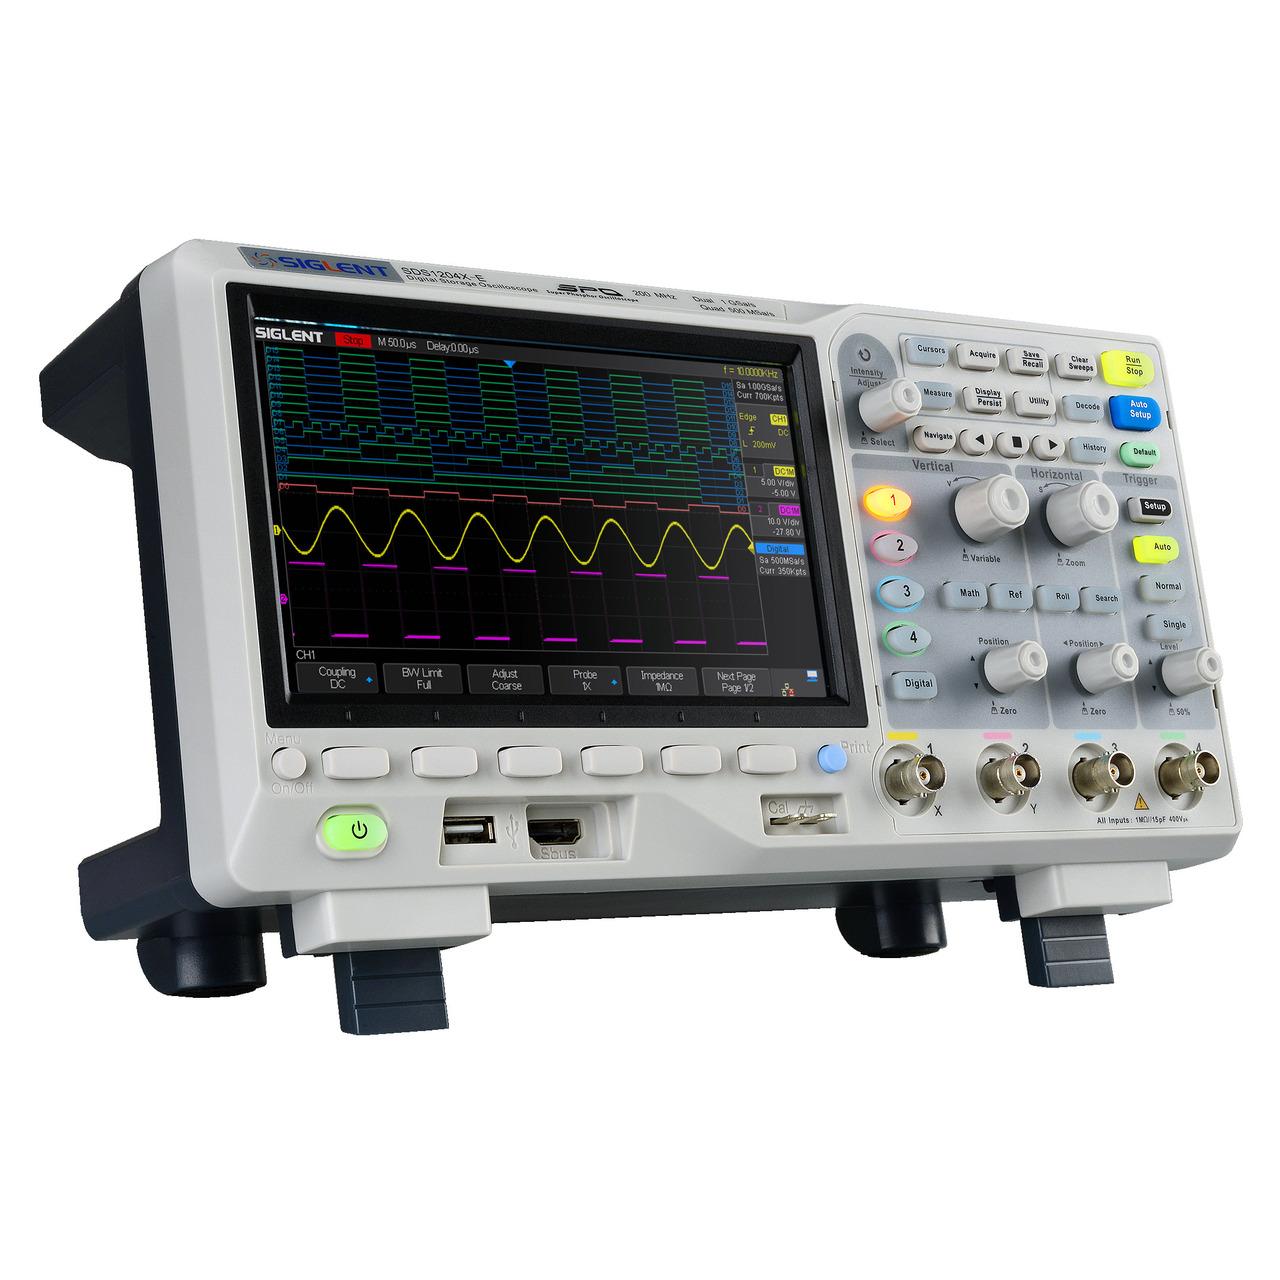 Siglent Oszilloskop SDS1204X-E- 4 Kanäle- BUS-Dekodierer- 14 Mpts Speichertiefe